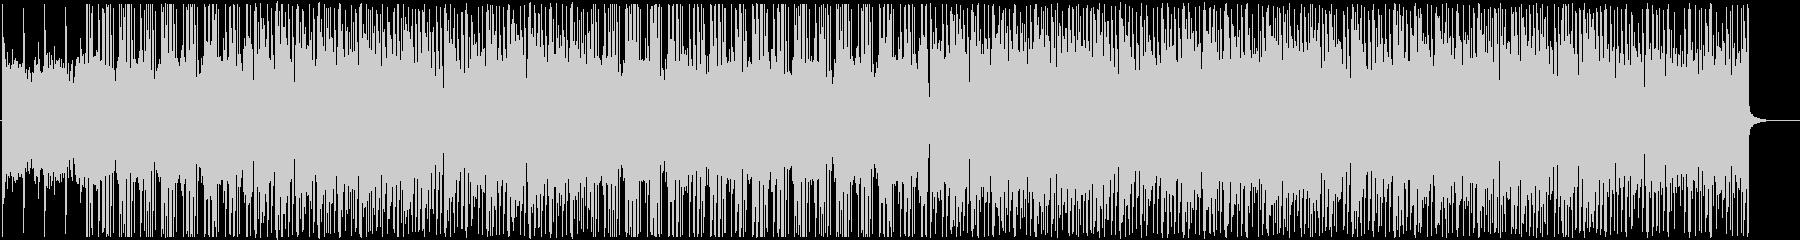 PV等浮遊間のあるチルホップ-エレクトロの未再生の波形